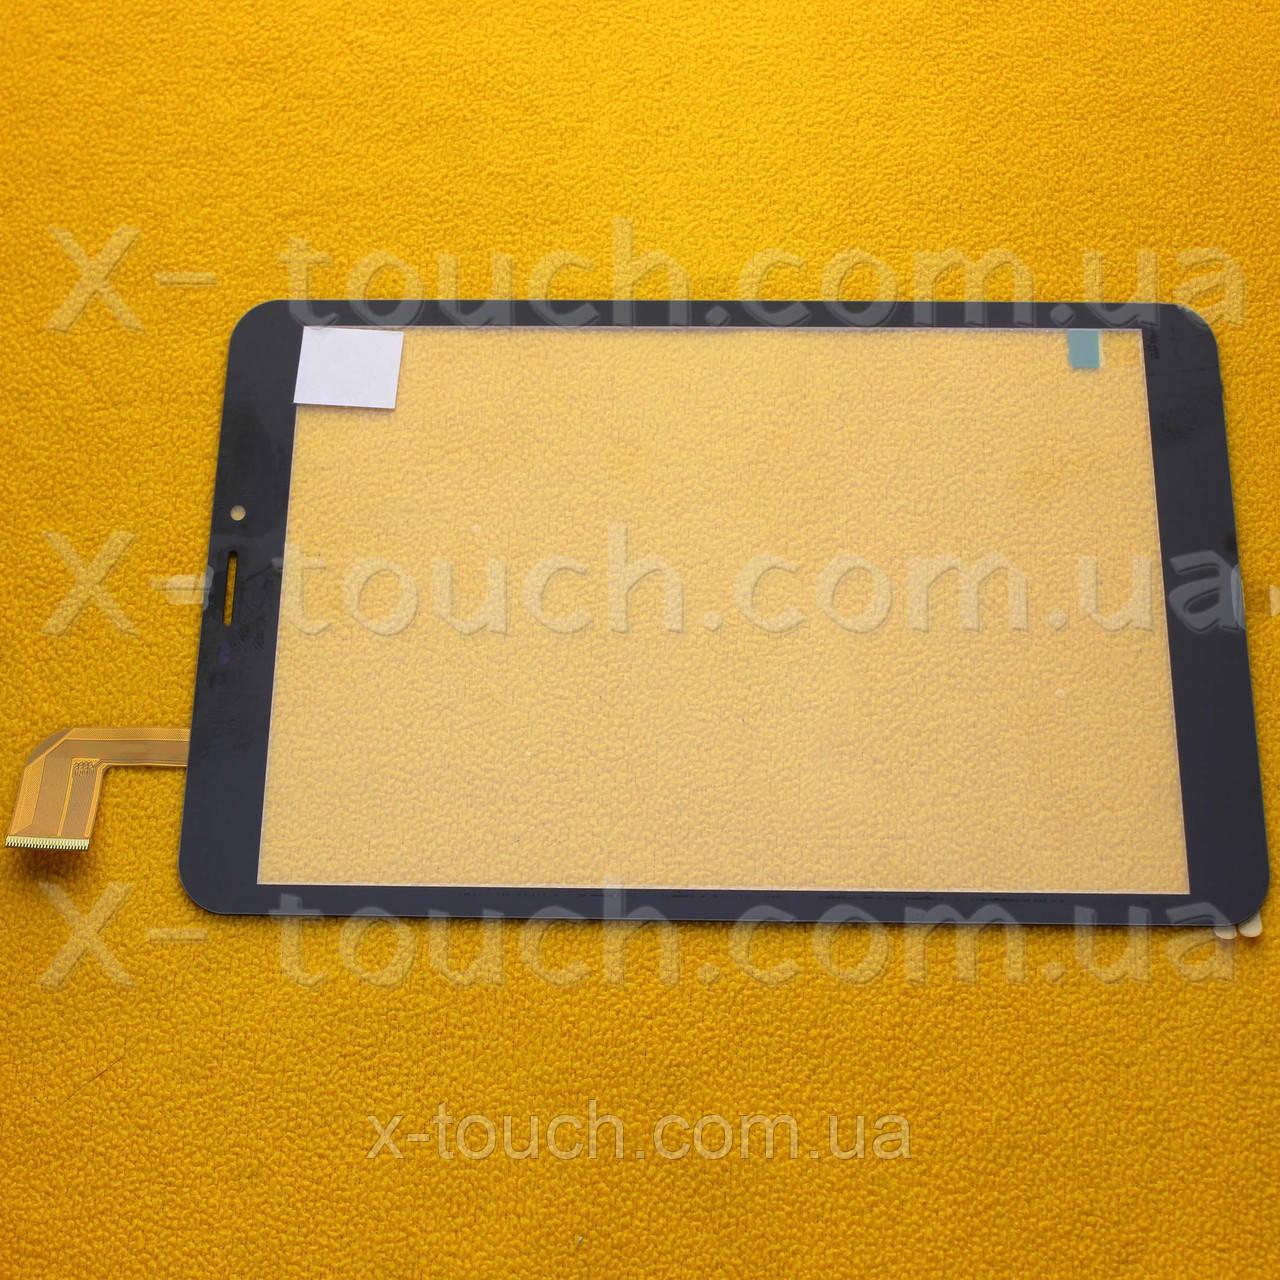 Тачскрин, сенсор WJ1312-FPC-V1.0 для планшета